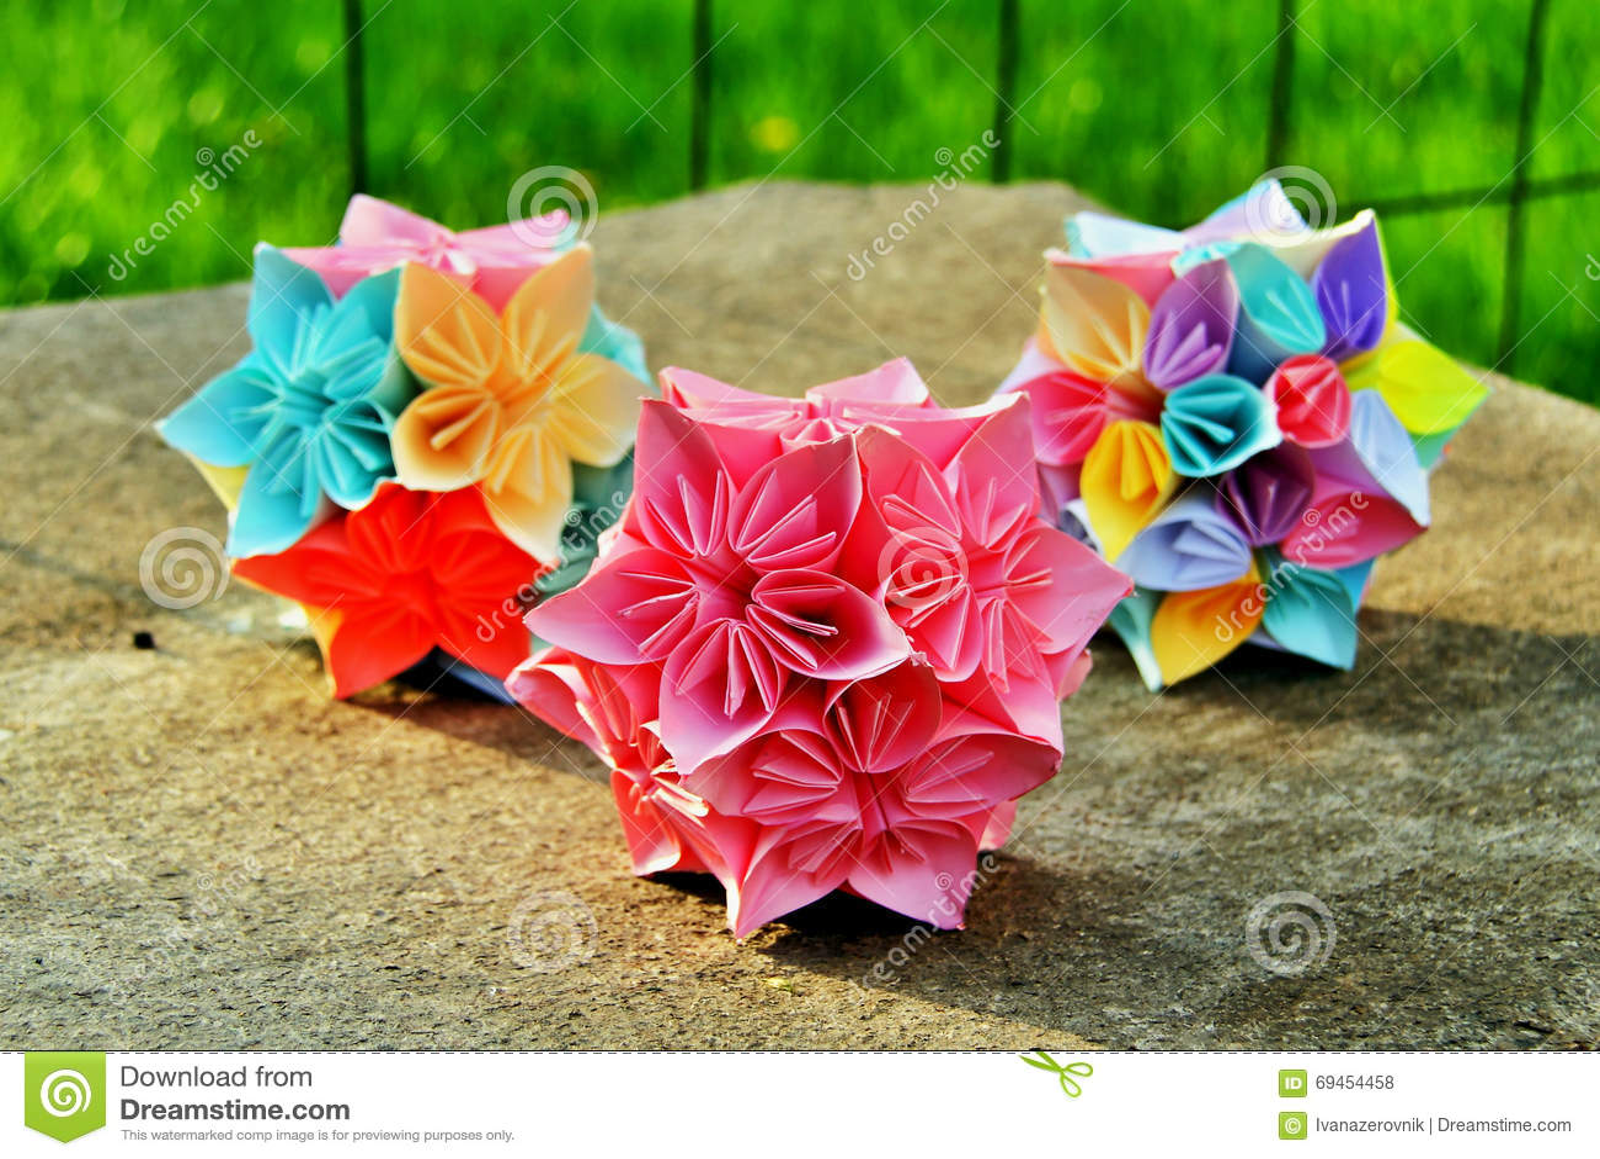 Origami kusudama flower balls stock photo image of culture balls download origami kusudama flower balls stock photo image of culture balls 69454458 mightylinksfo